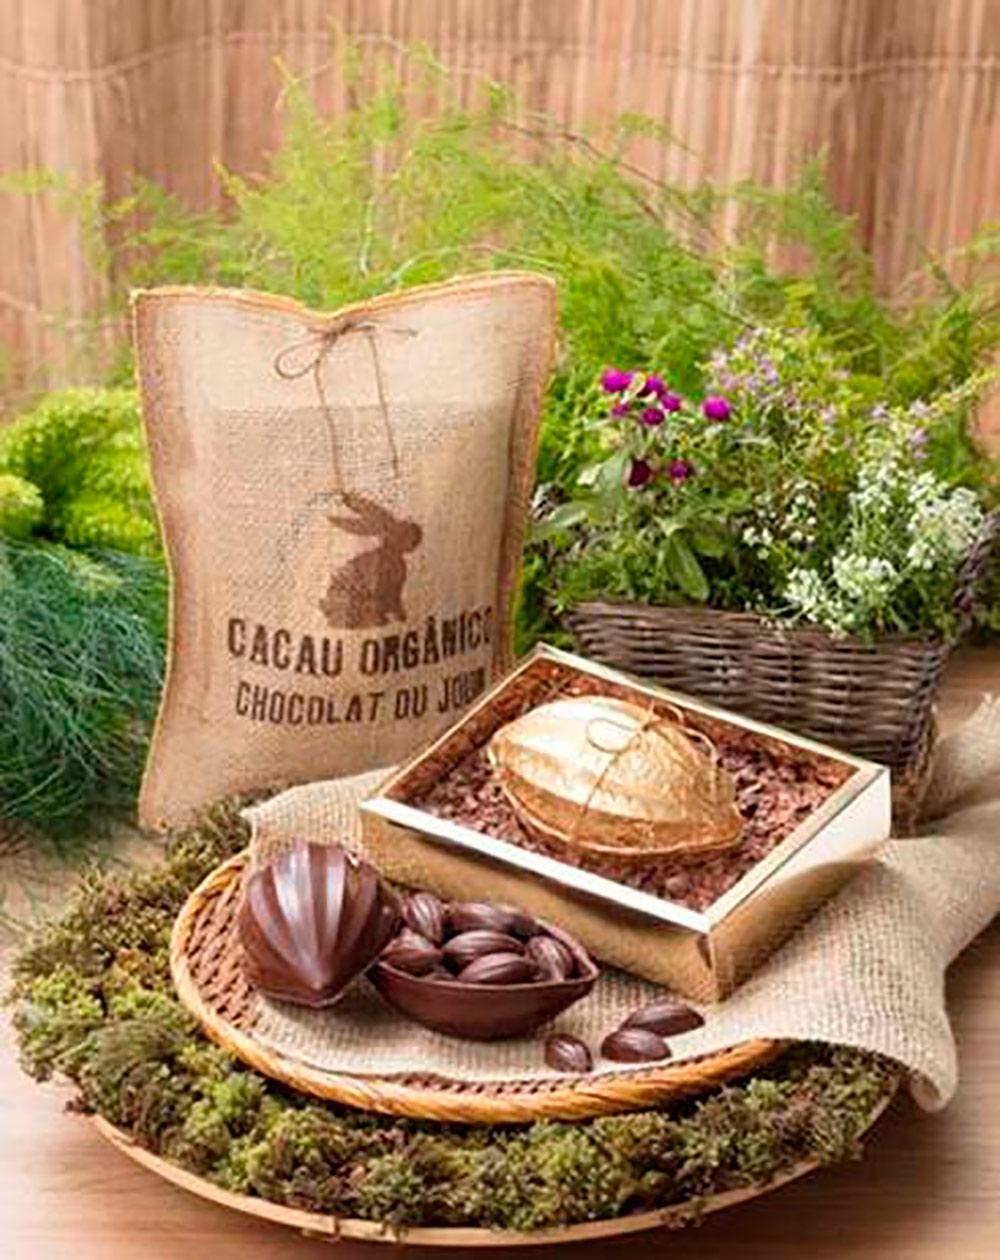 Onde comprar ovos de Páscoa Chocolat du jour